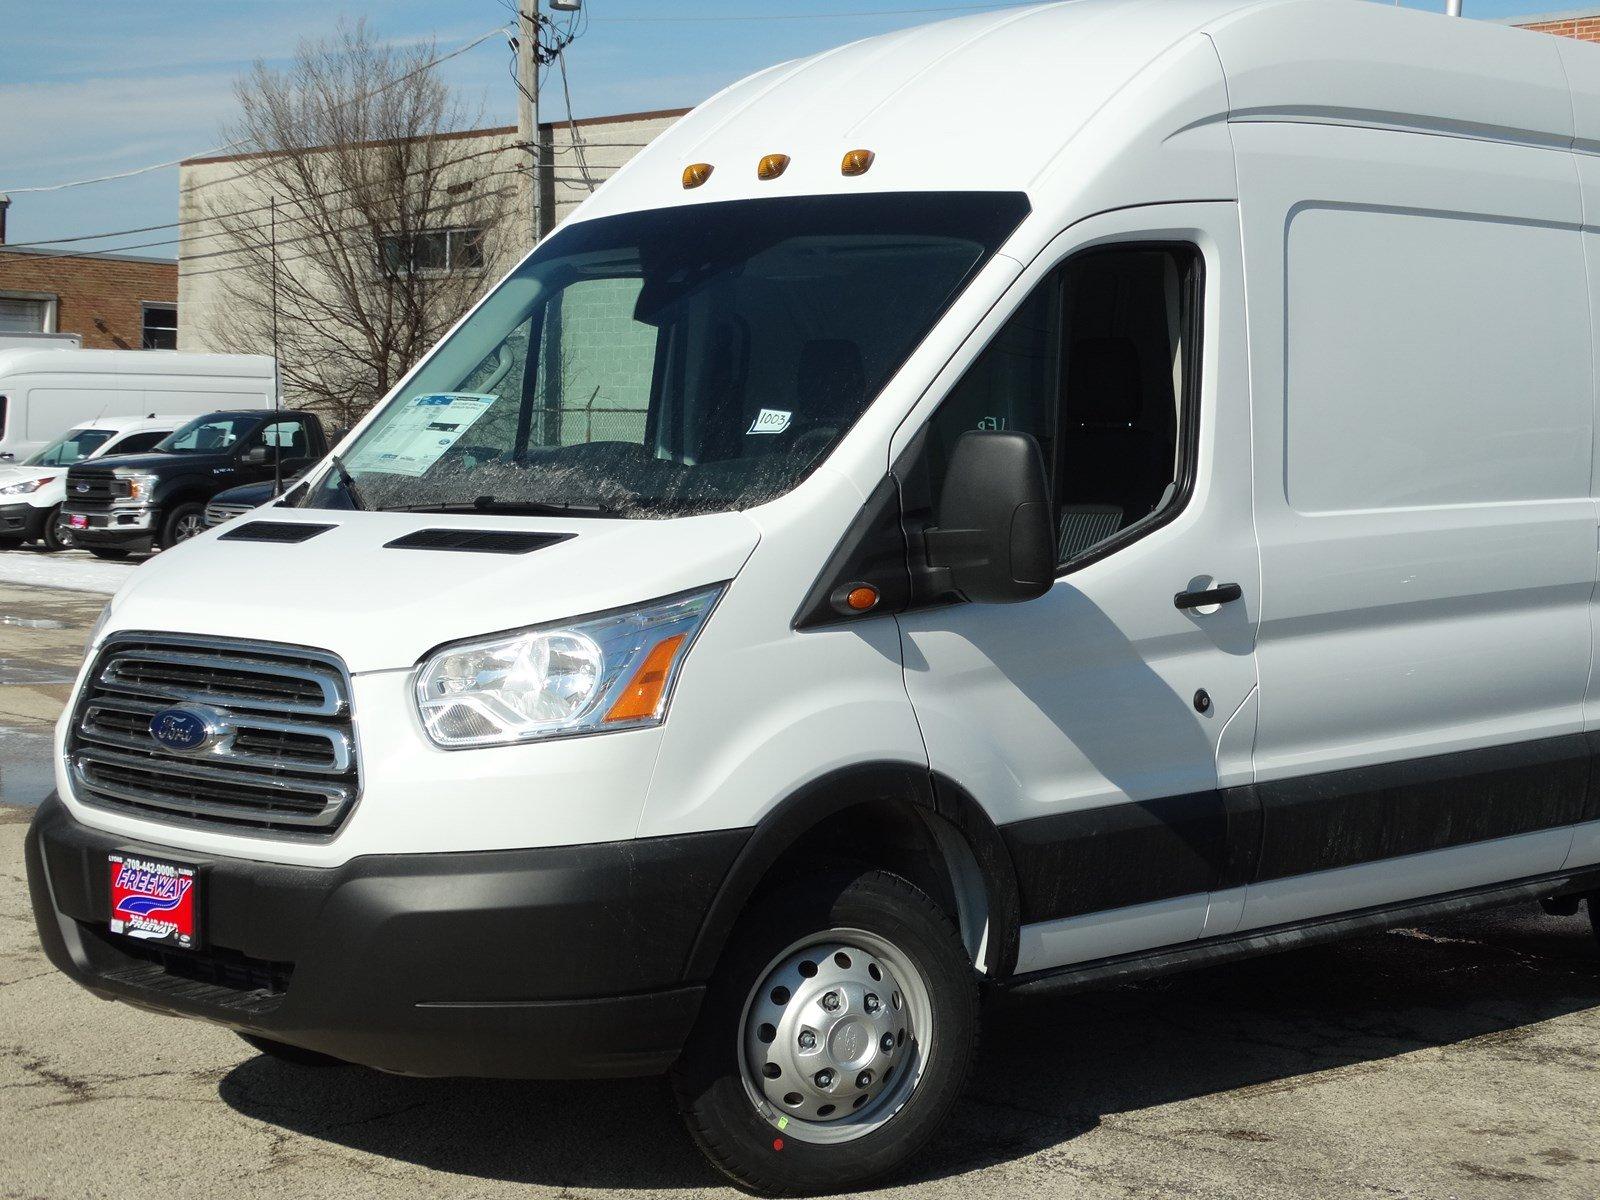 Ford Cargo Van For Sale >> New 2019 Ford Transit Van Van High Roof Hd Ext Cargo Van For Sale Lyons Il Vin 1ftws4xv2kka59068